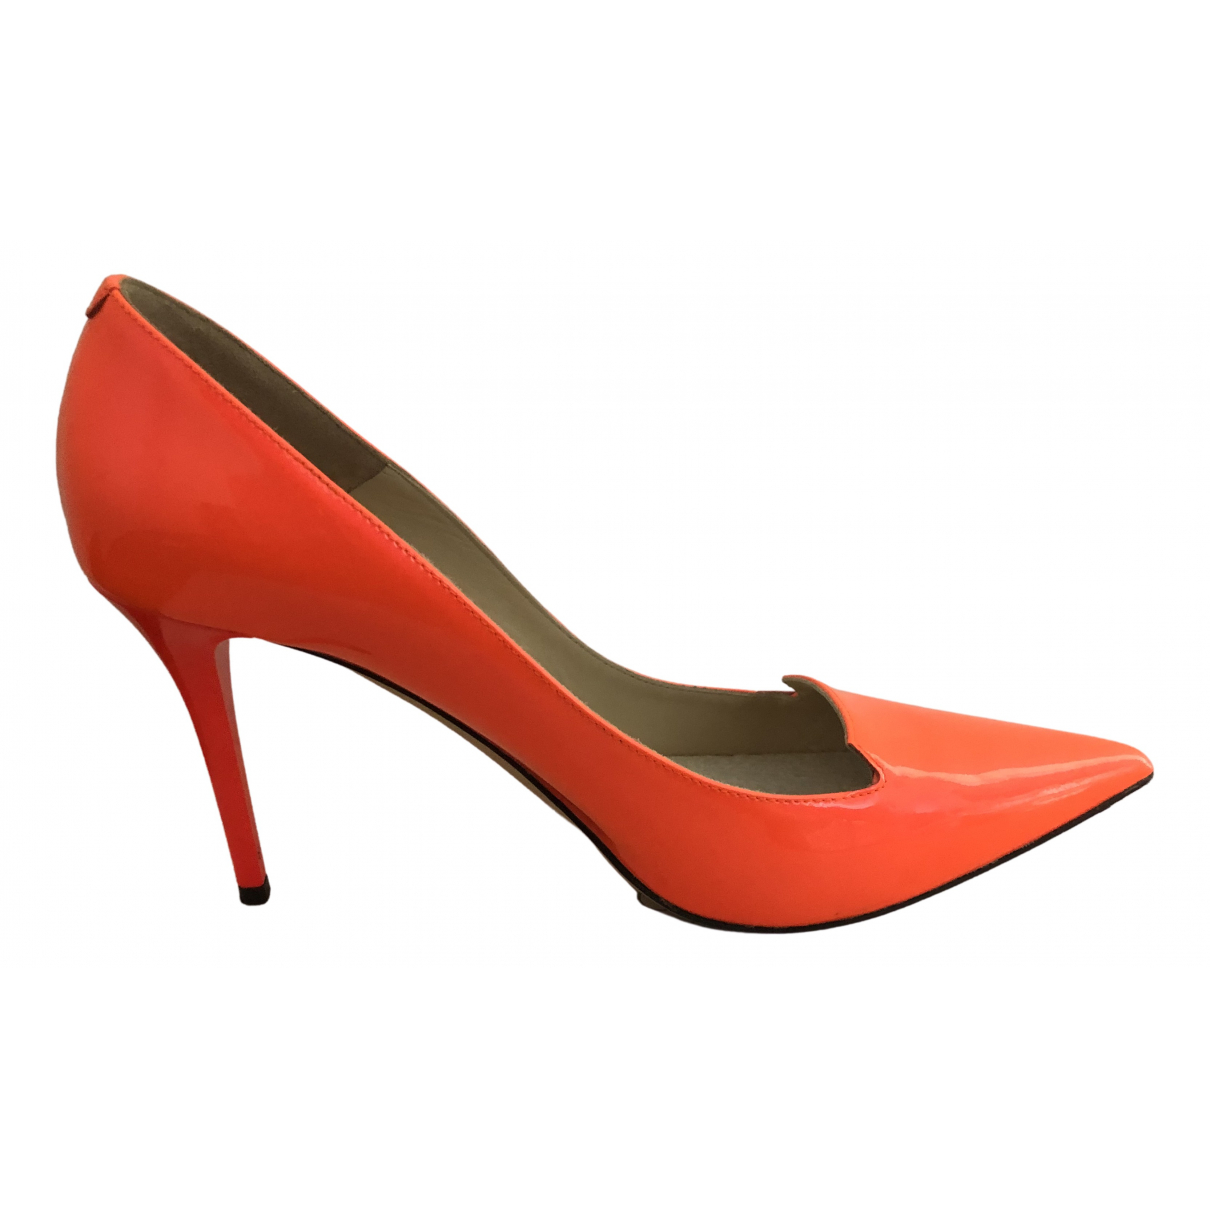 Jimmy Choo \N Orange Patent leather Heels for Women 37.5 EU